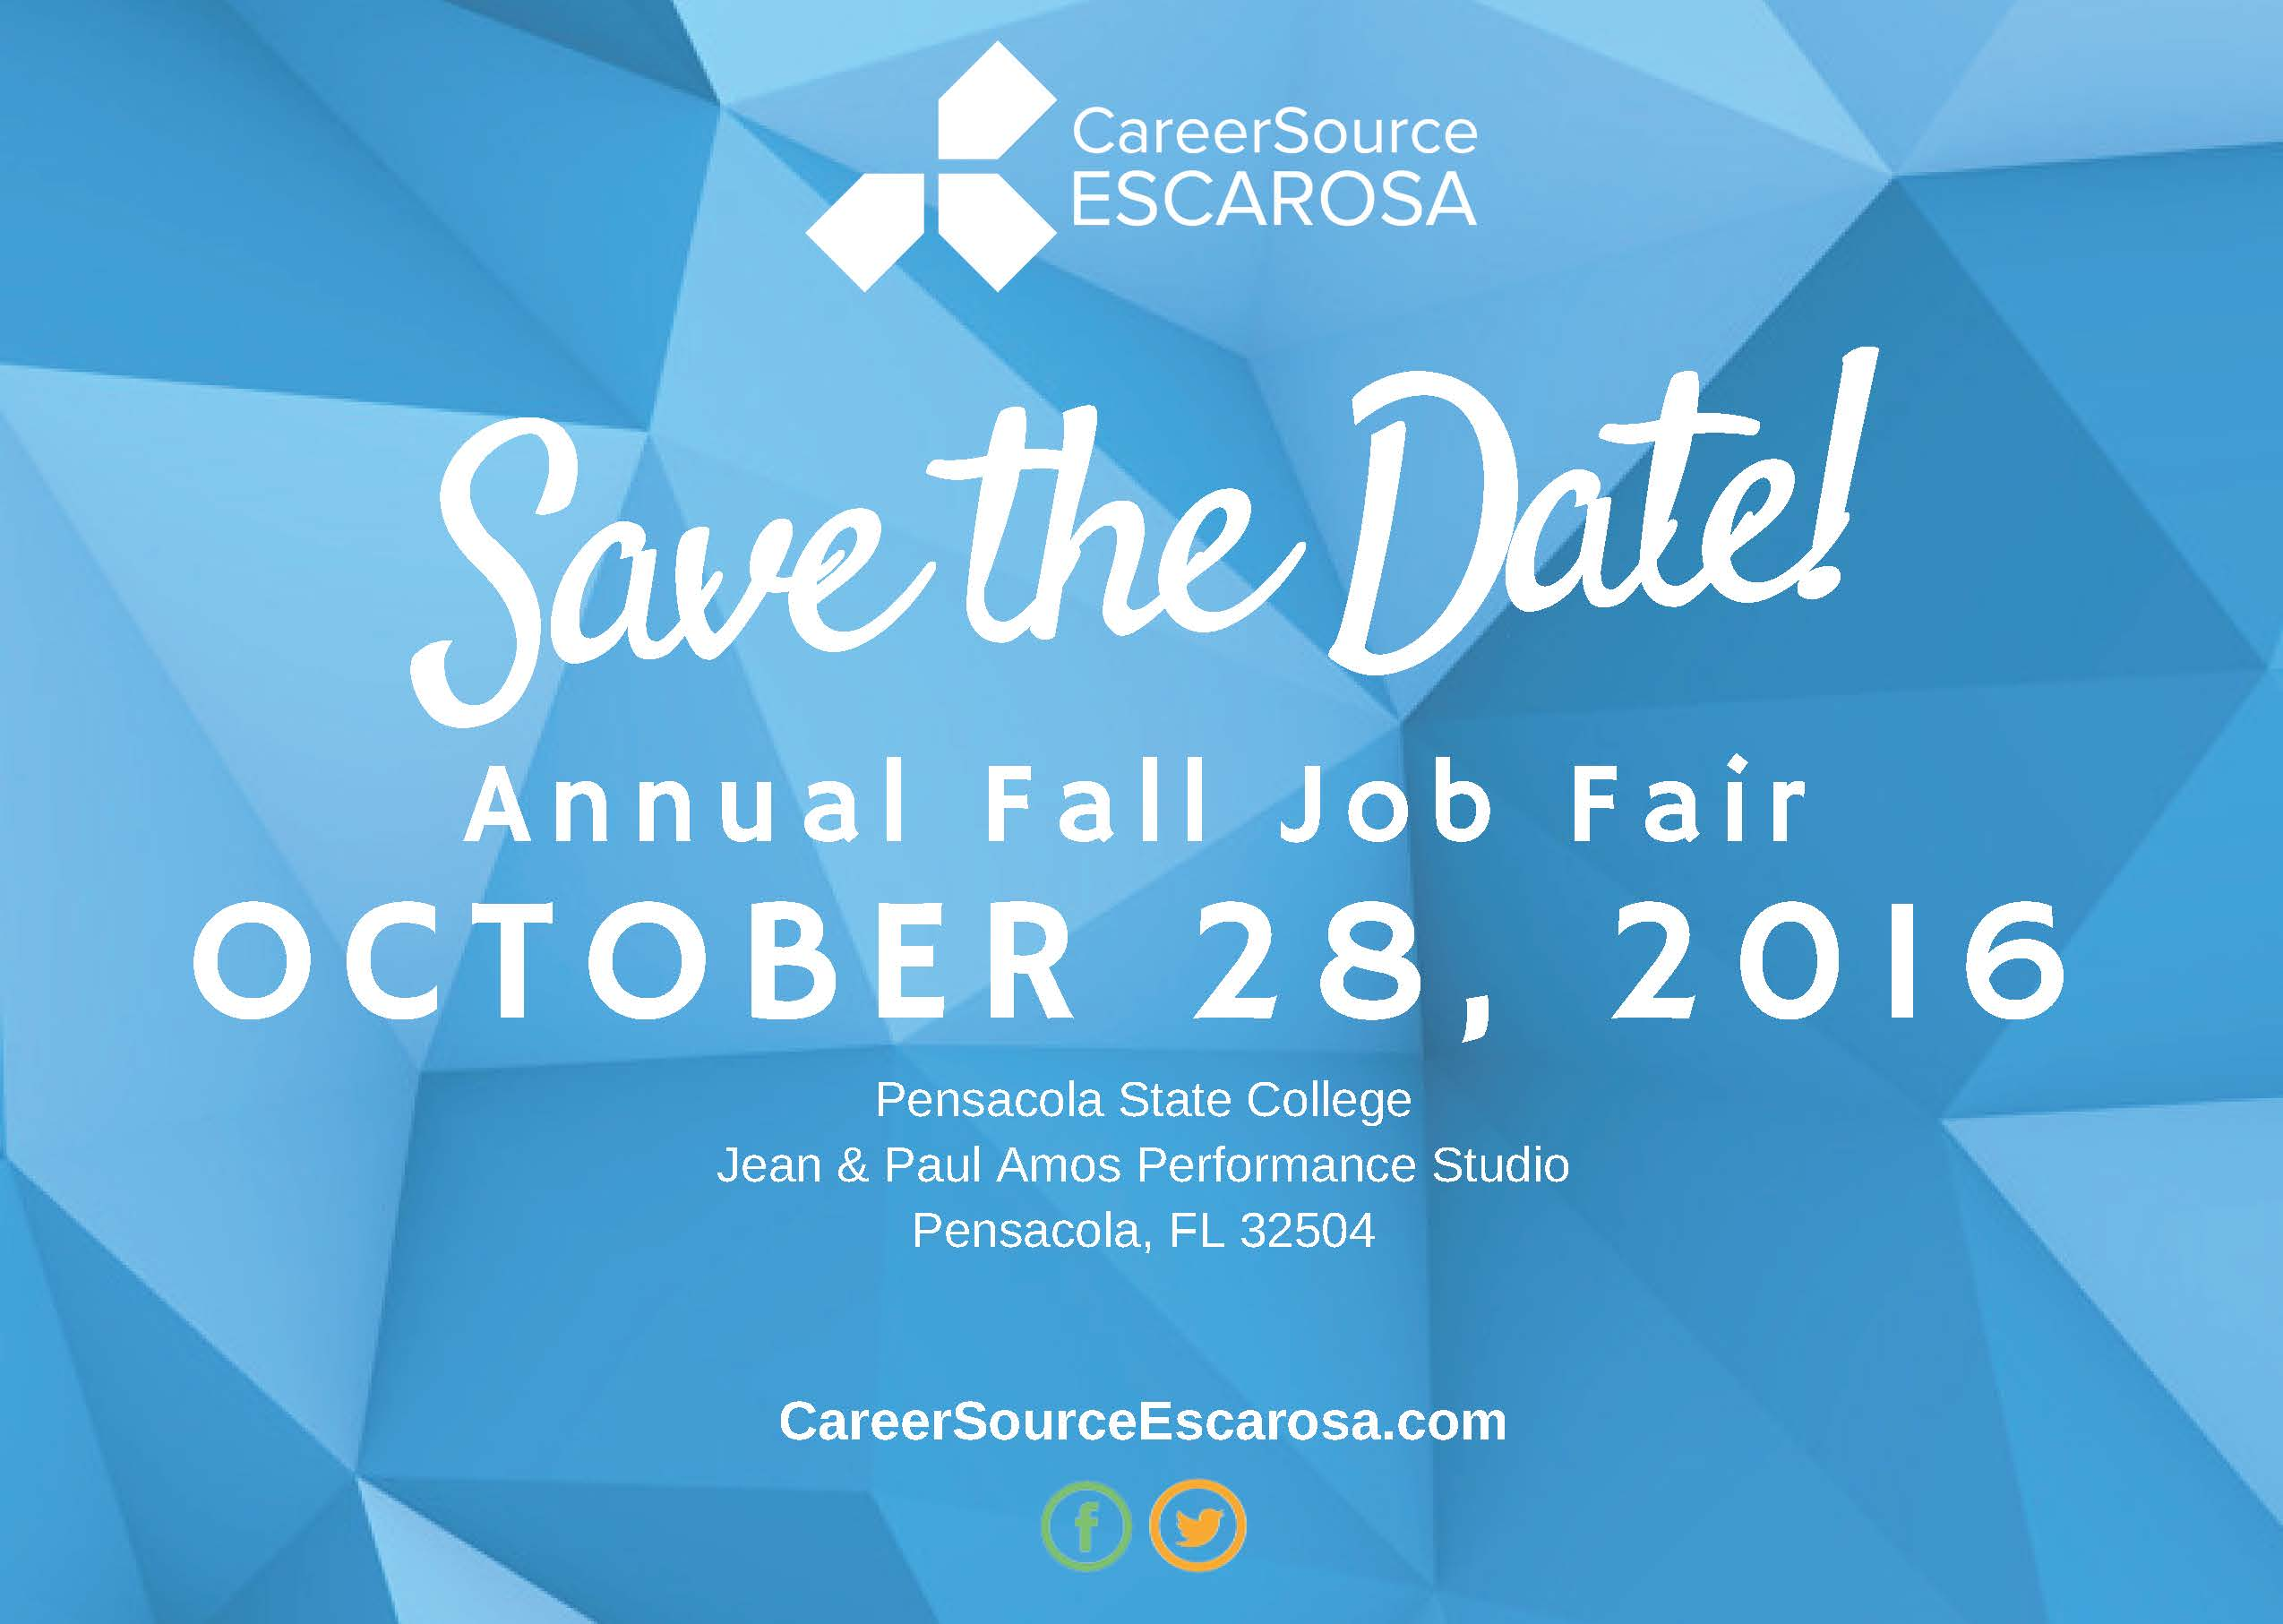 save-the-date_2016 Fall Job Fair